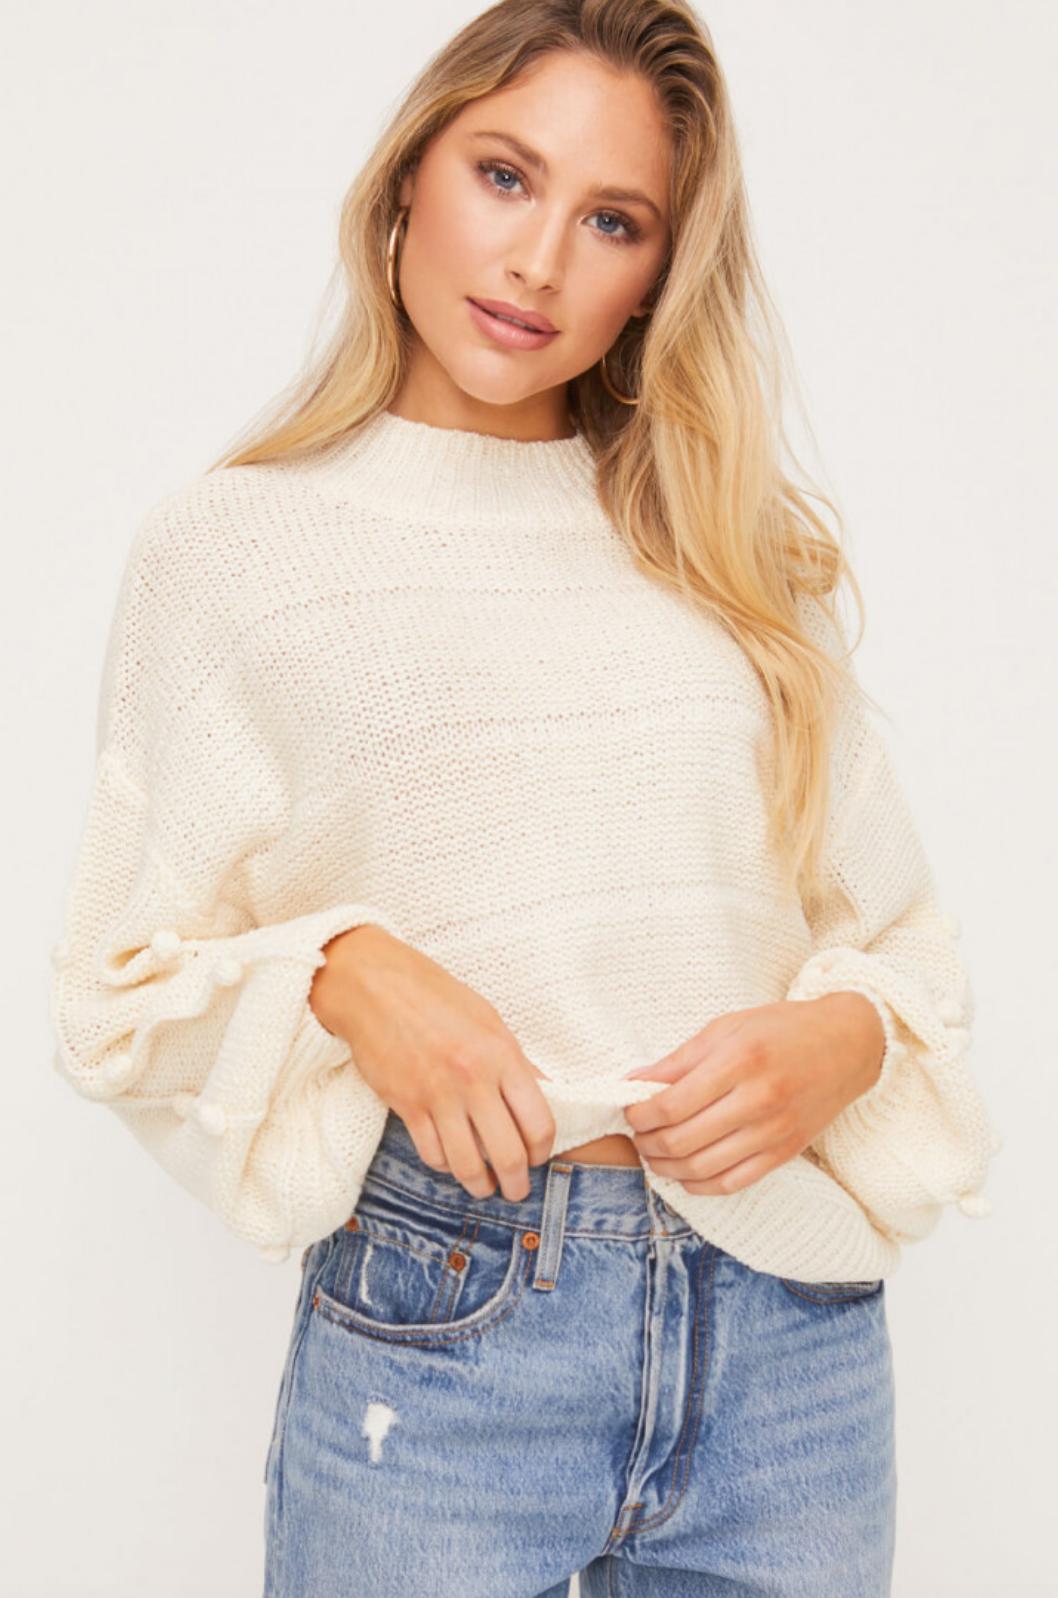 Lush Pom Pom Sleeve Mockneck Sweater-Cream